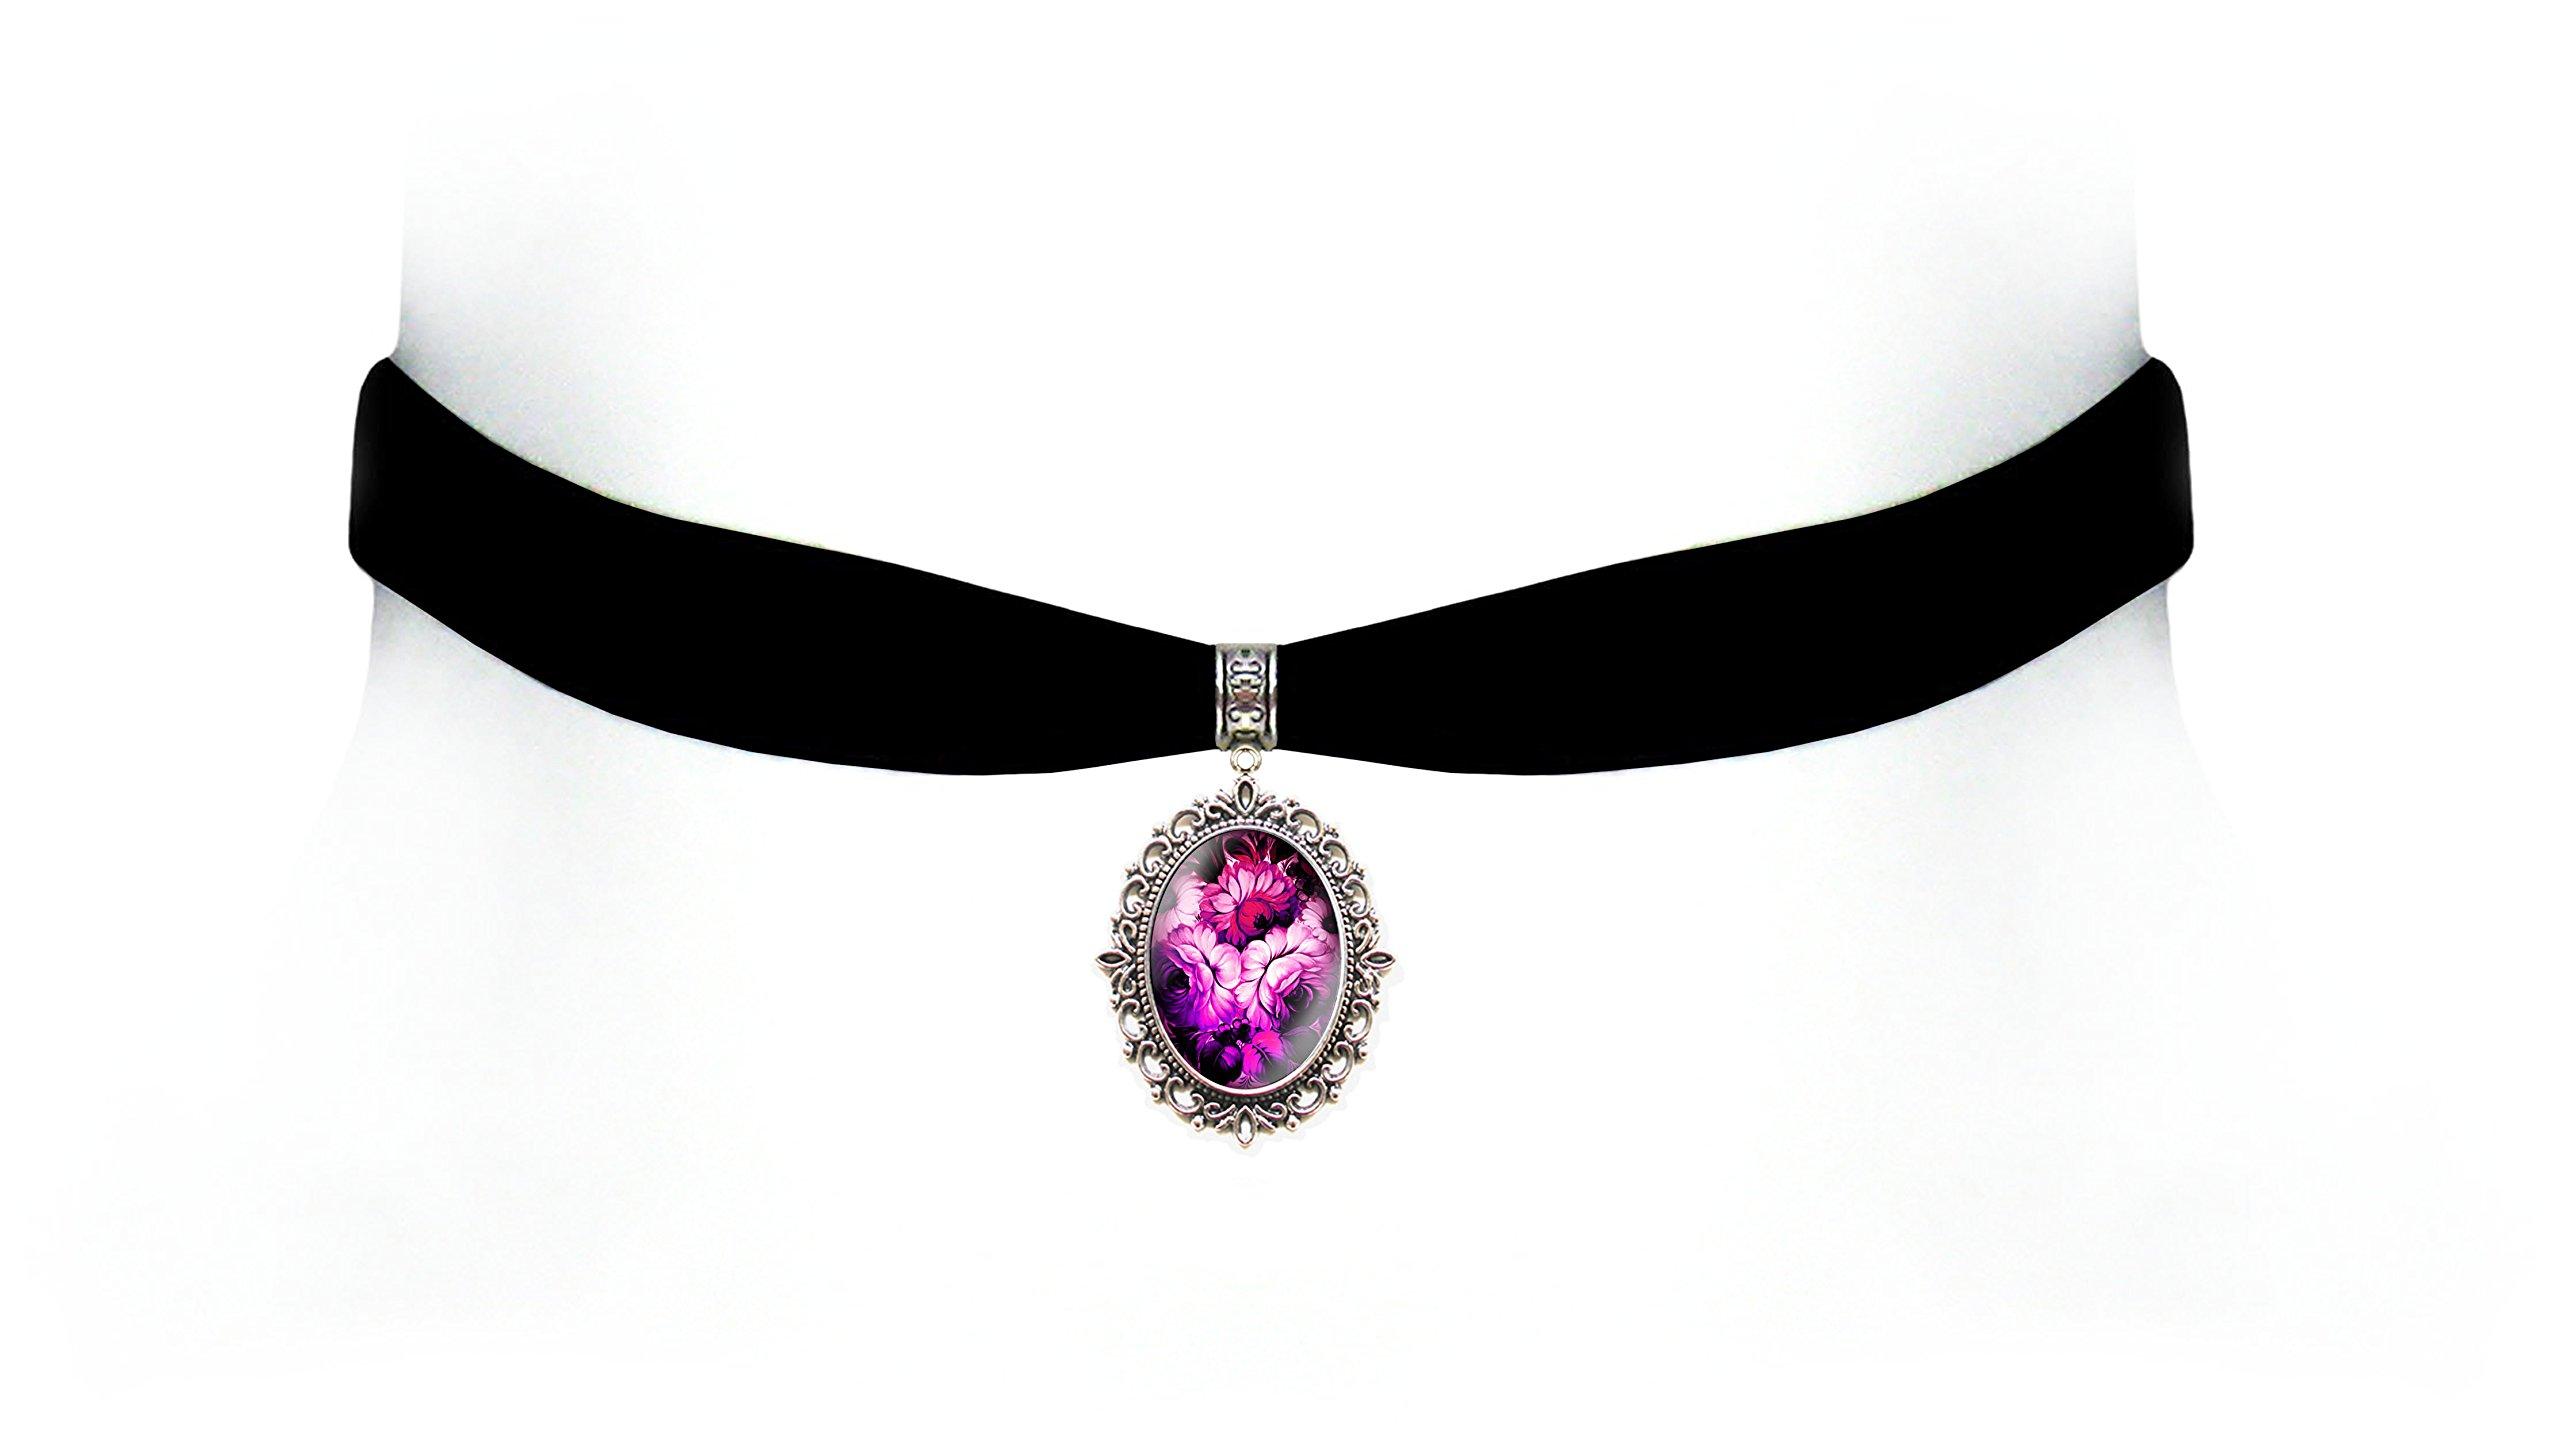 Victorian Vault Black Velvet Flower Choker Steampunk Gothic Pendant Necklace (Fuschia)